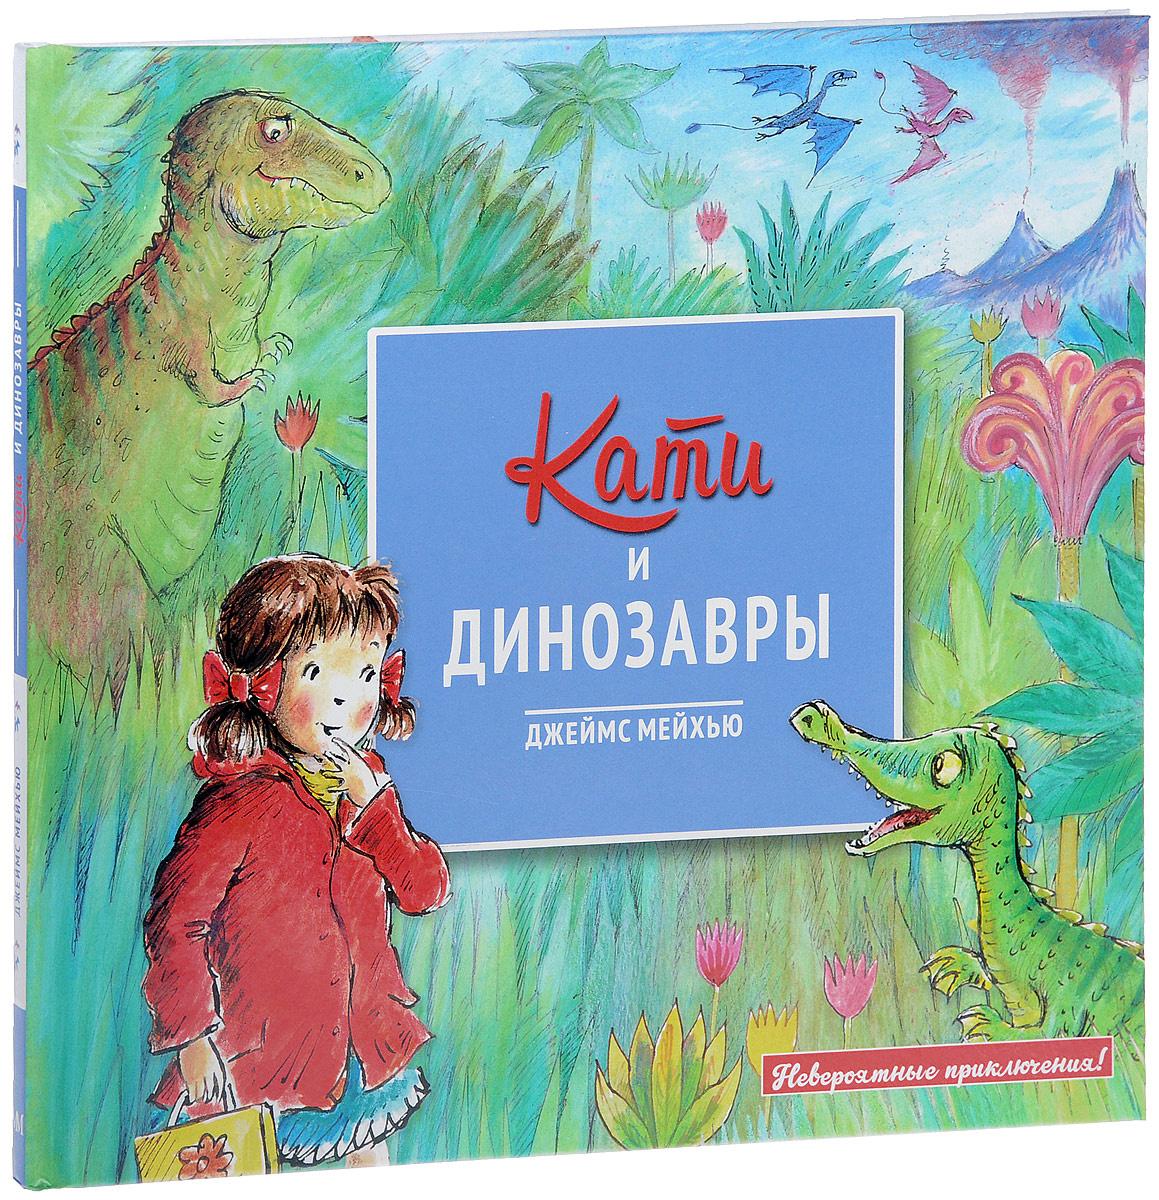 Кати и динозавры | Мейхью Джеймс #1